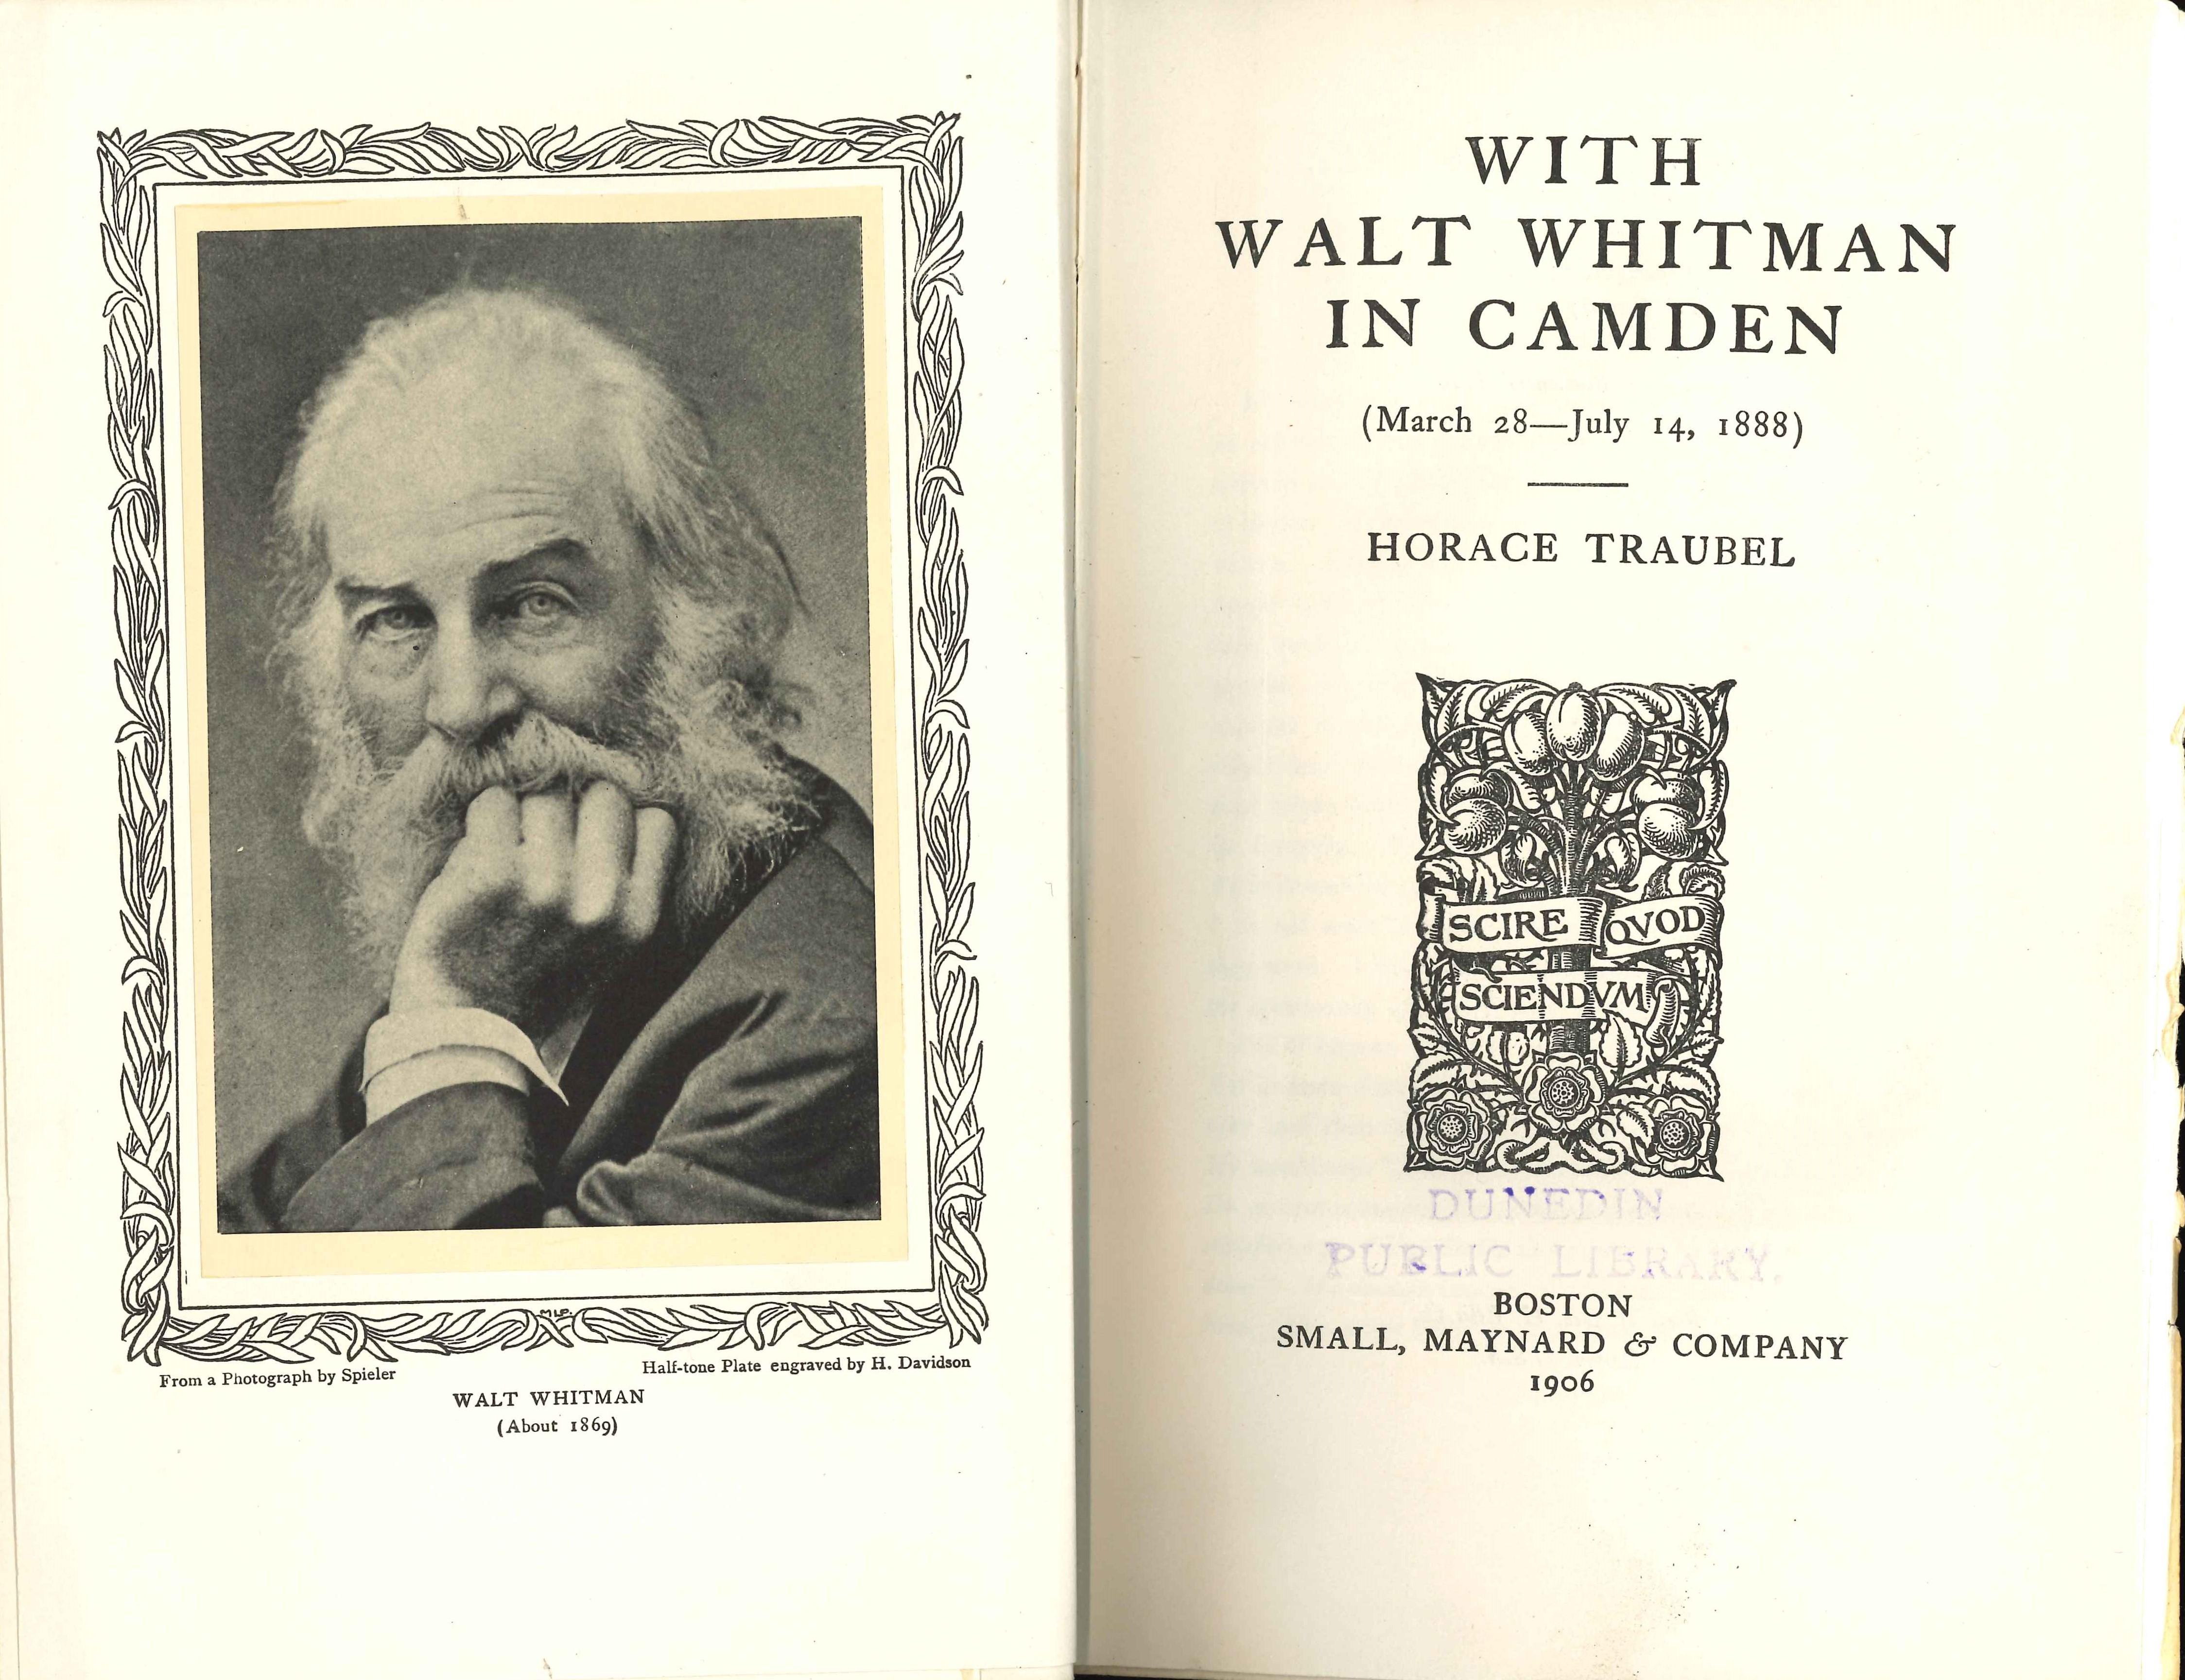 Horace Traubel. With Walt Whitman in Camden: March 28 – July 14 1888. Boston: Small, Maynard & Company, 1906.